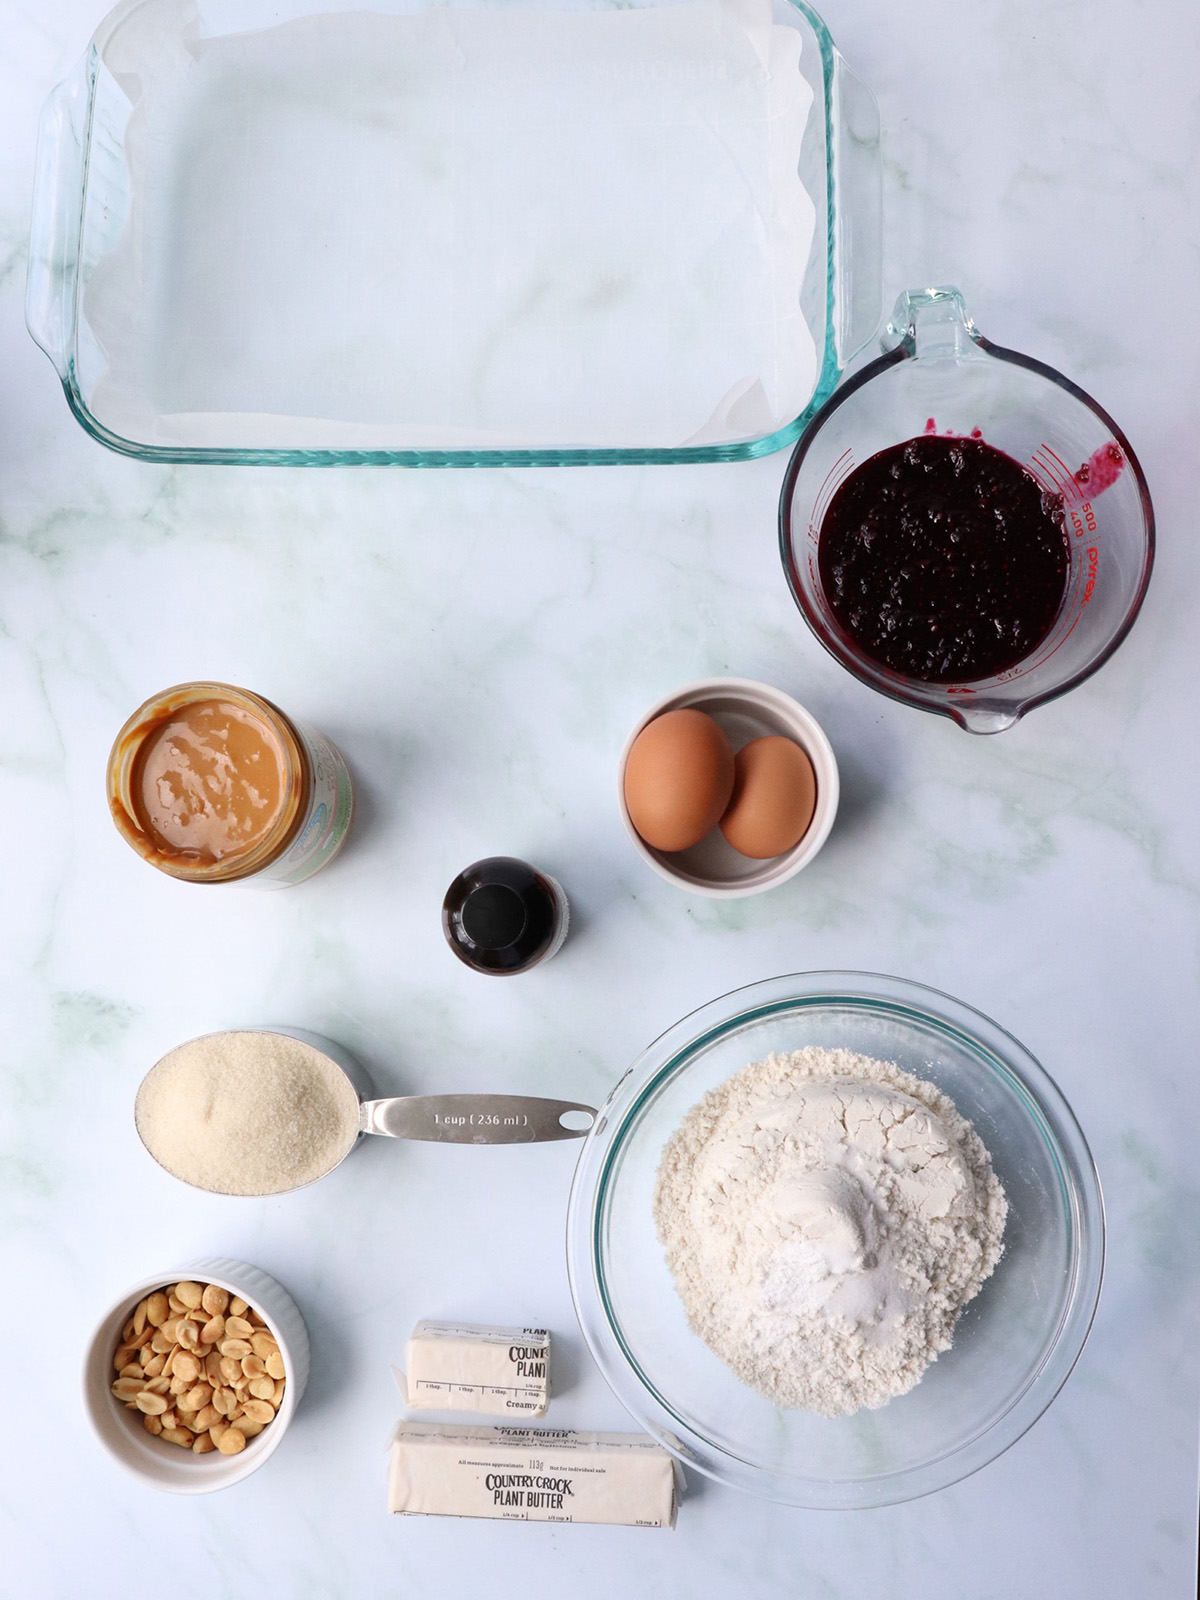 Ingredients for making PB&J Bars